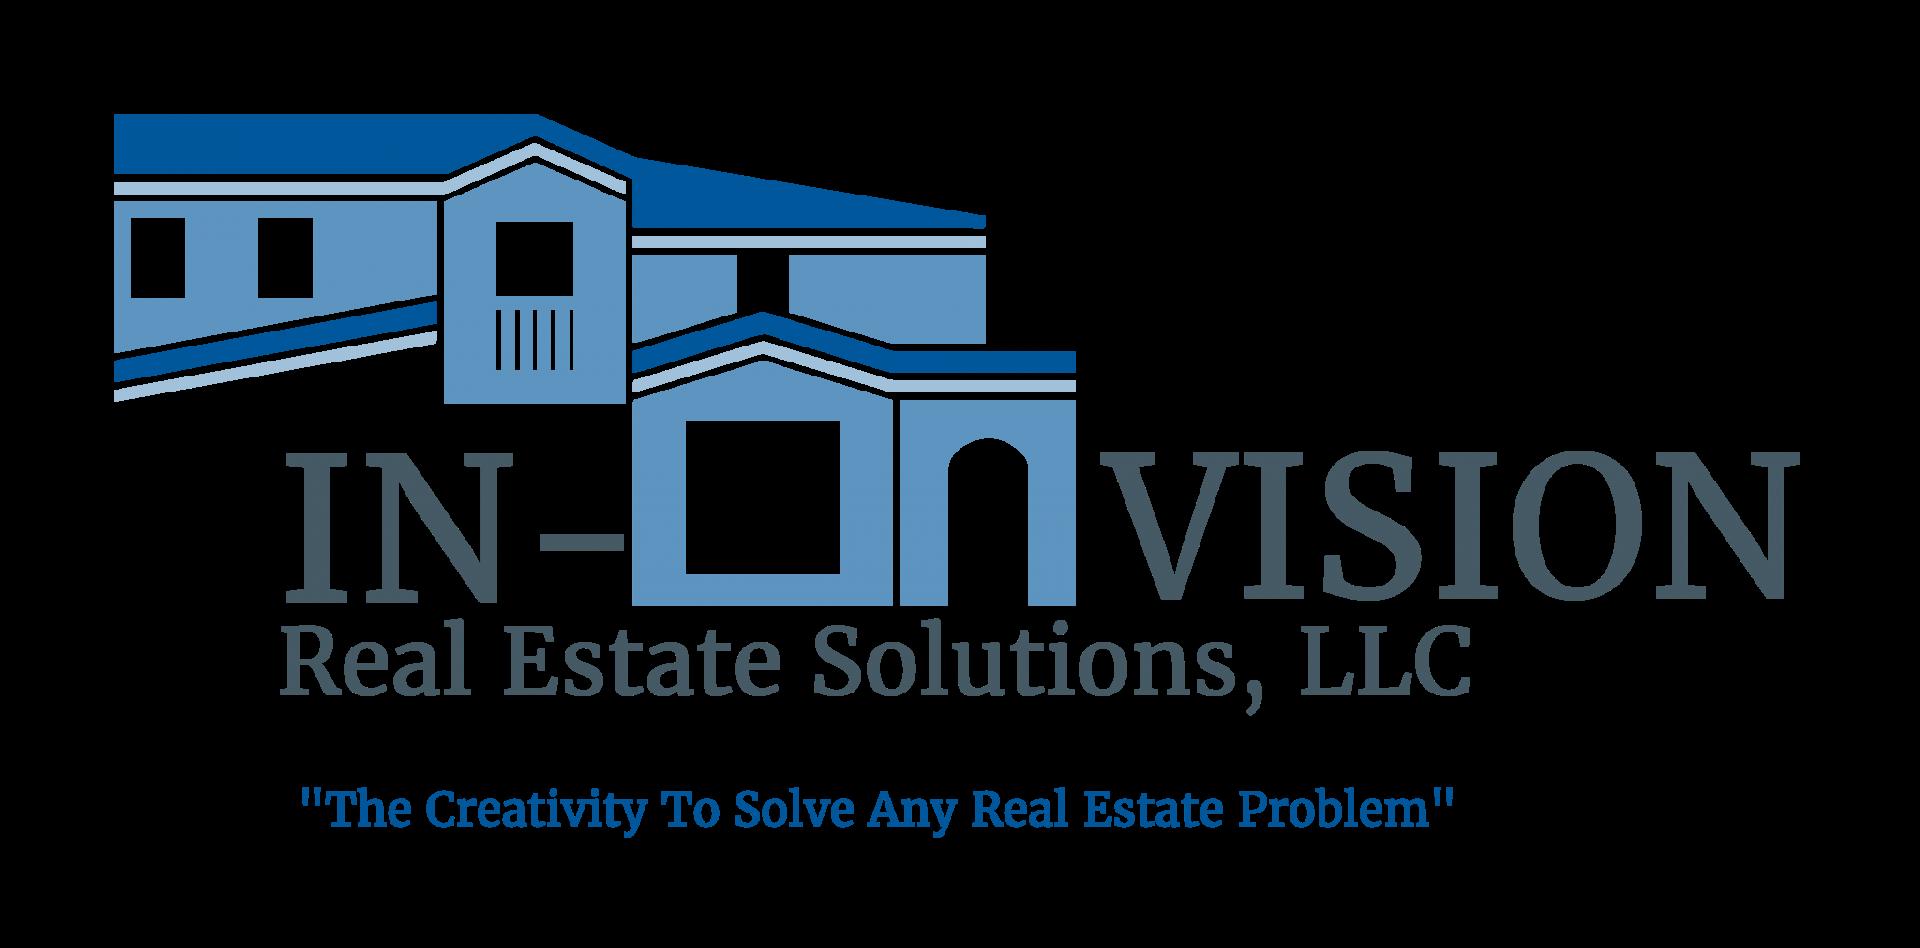 IN-VISION Real Estate Solutions, LLC logo